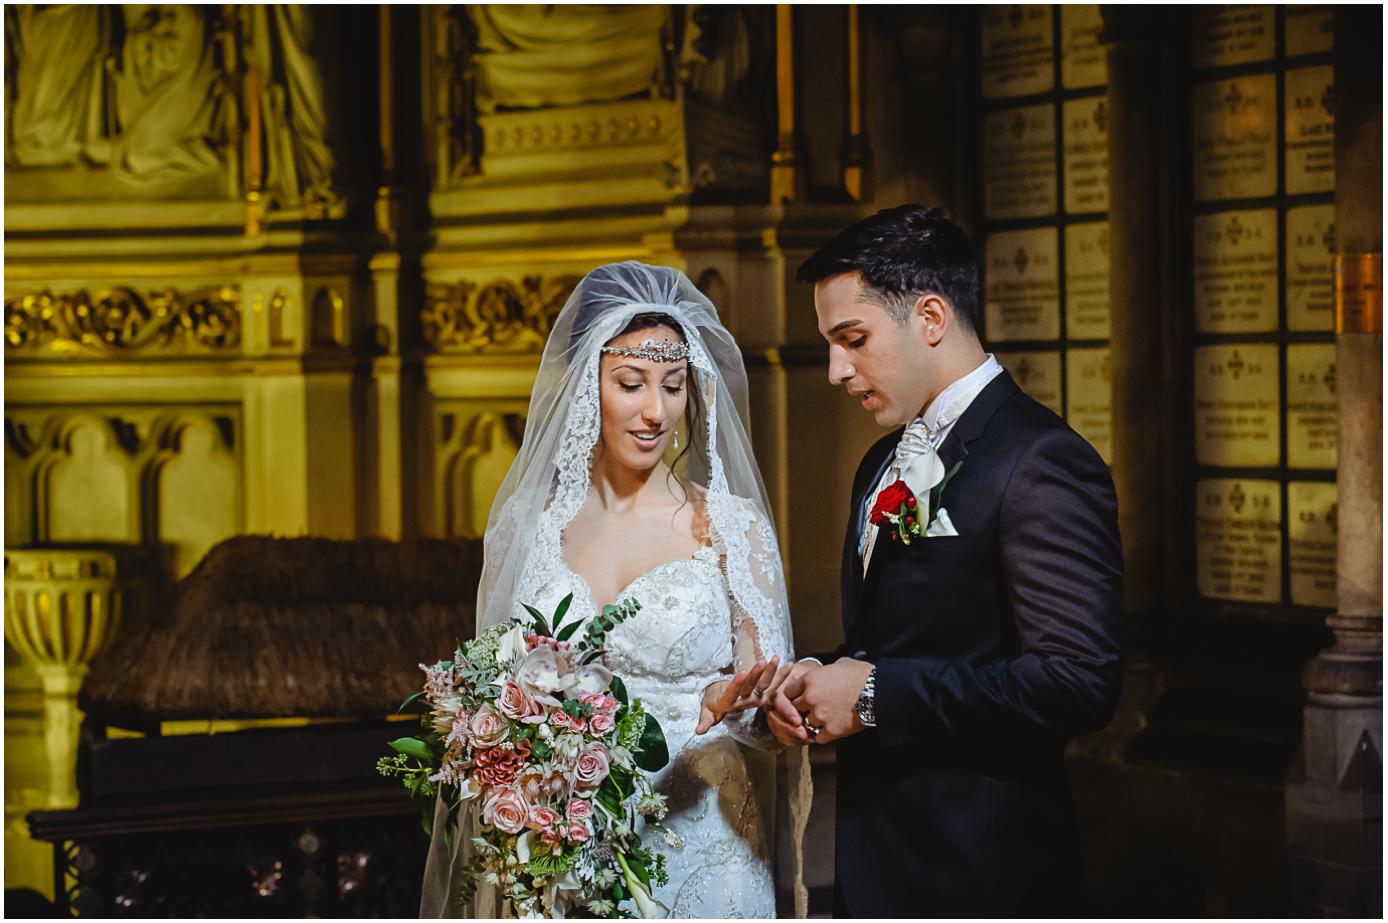 iranian wedding photographer 91 - Drapers Hall London Wedding Photographer